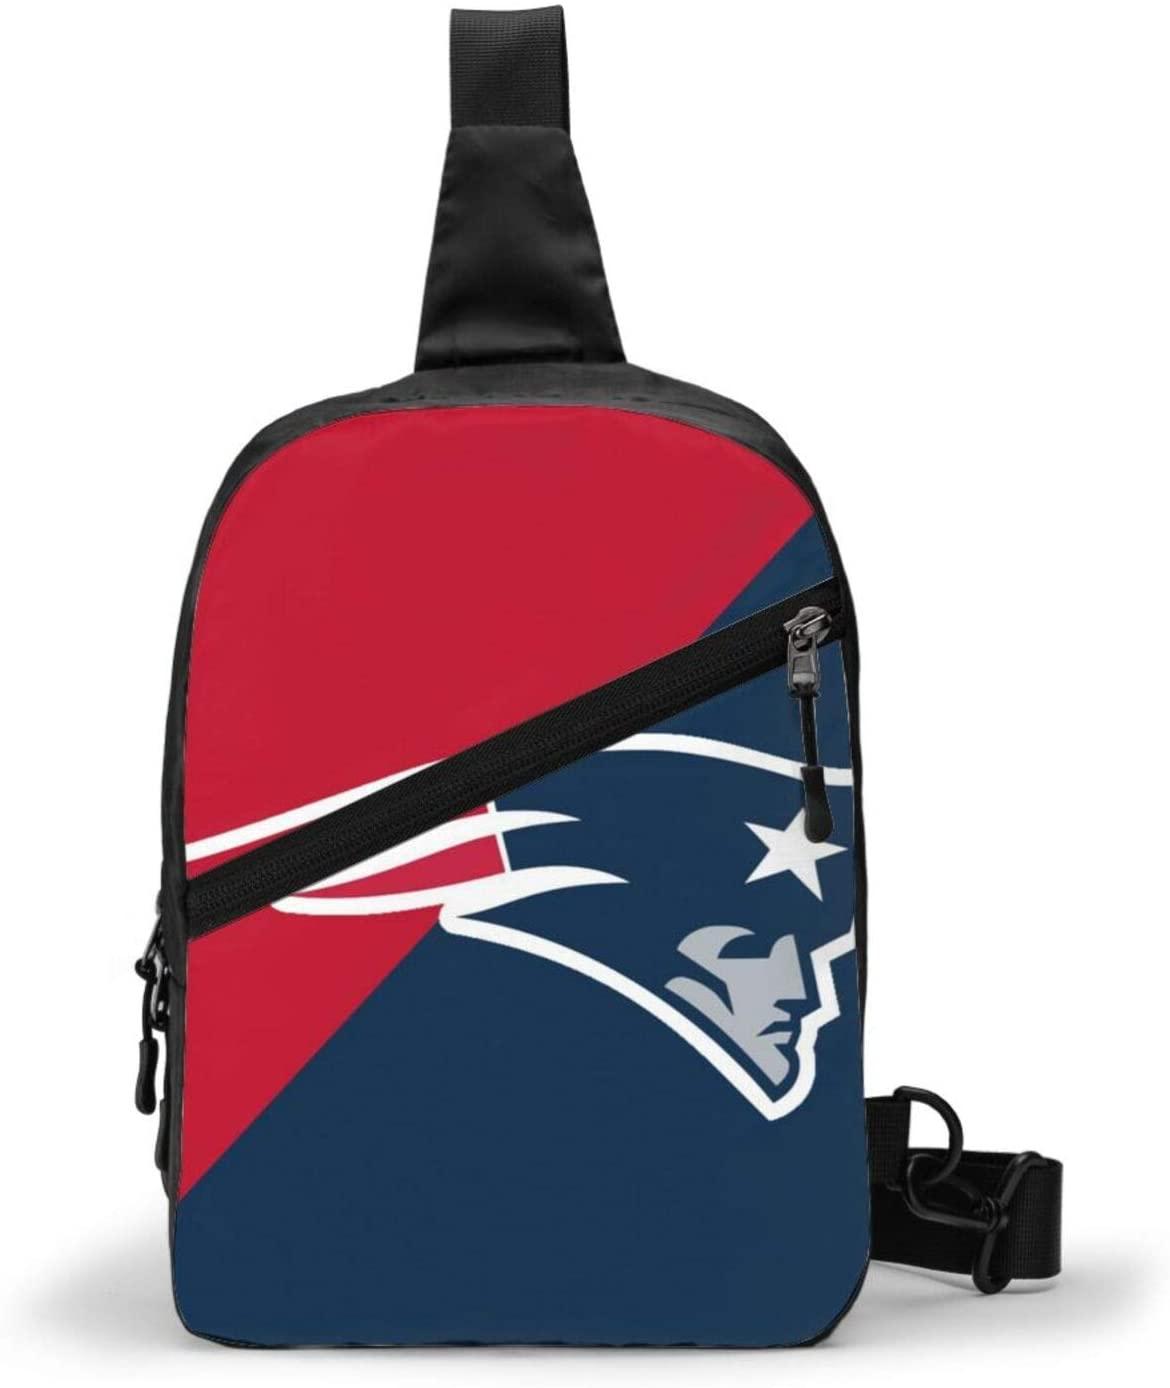 FDLB New England Football Patriot Chest Package Sling Bag Large Capacity Multipurpose Daypack Men Women Chest Shoulder Backpack Casual Crossbody